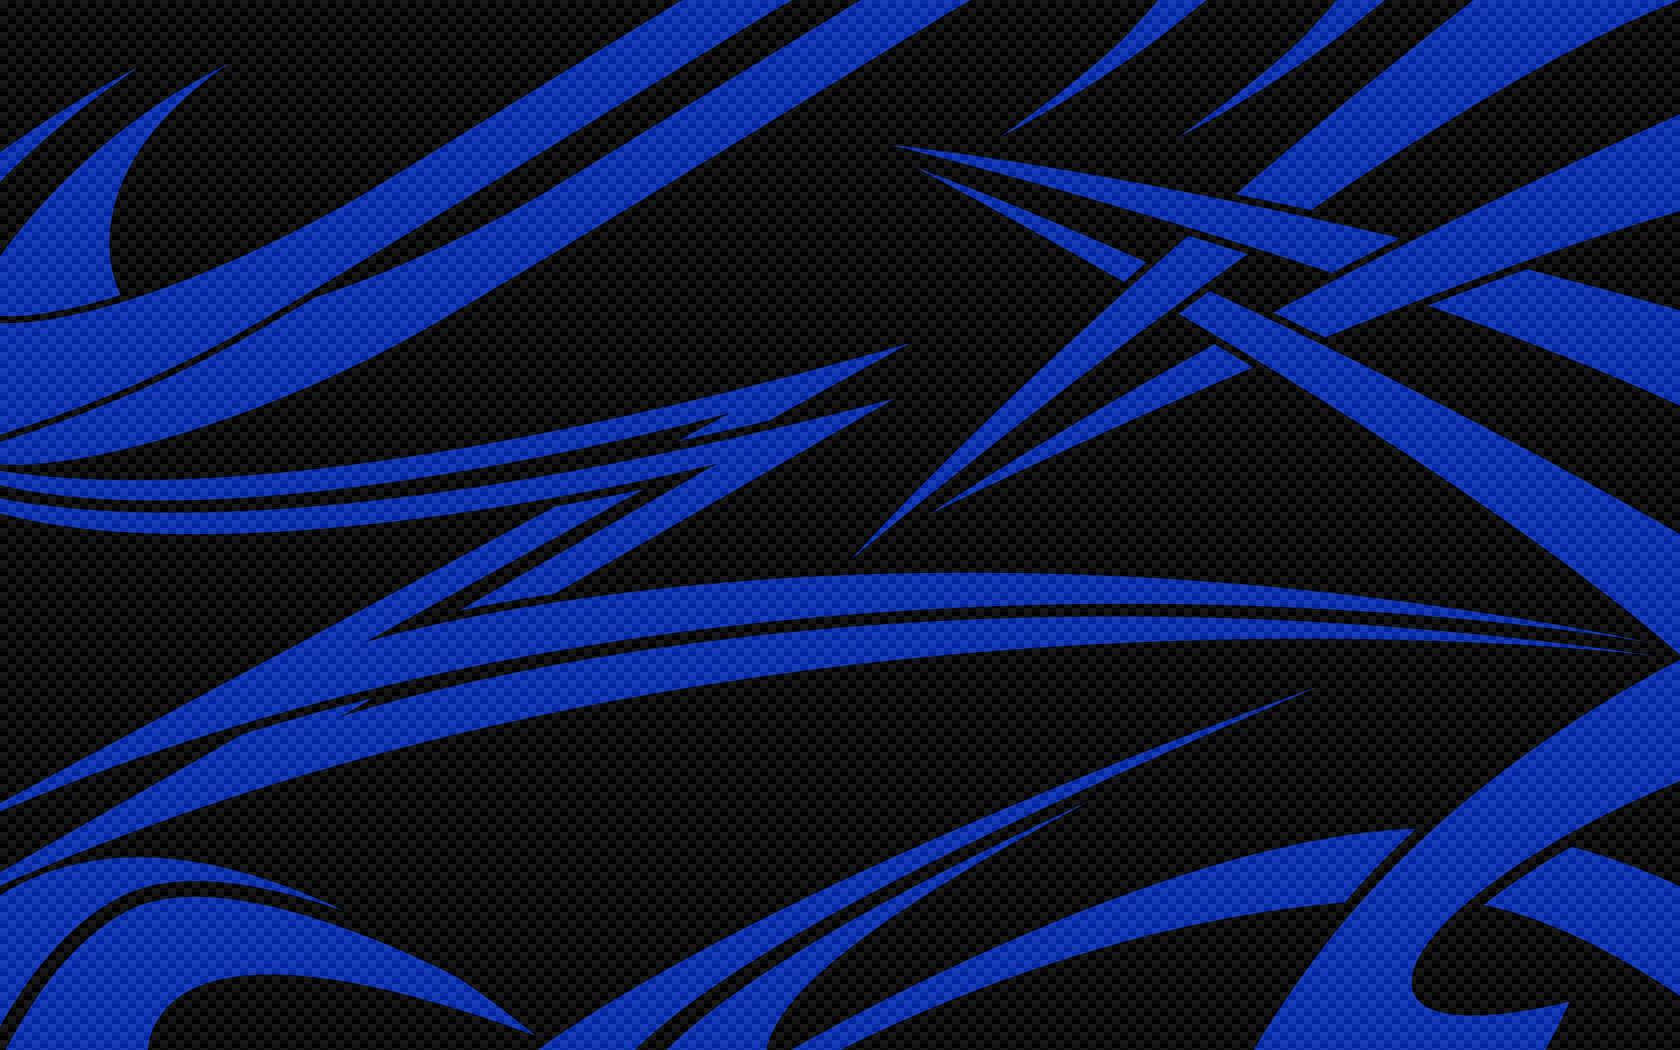 1680x1050 Black Blue Carbon desktop PC and Mac wallpaper 1680x1050